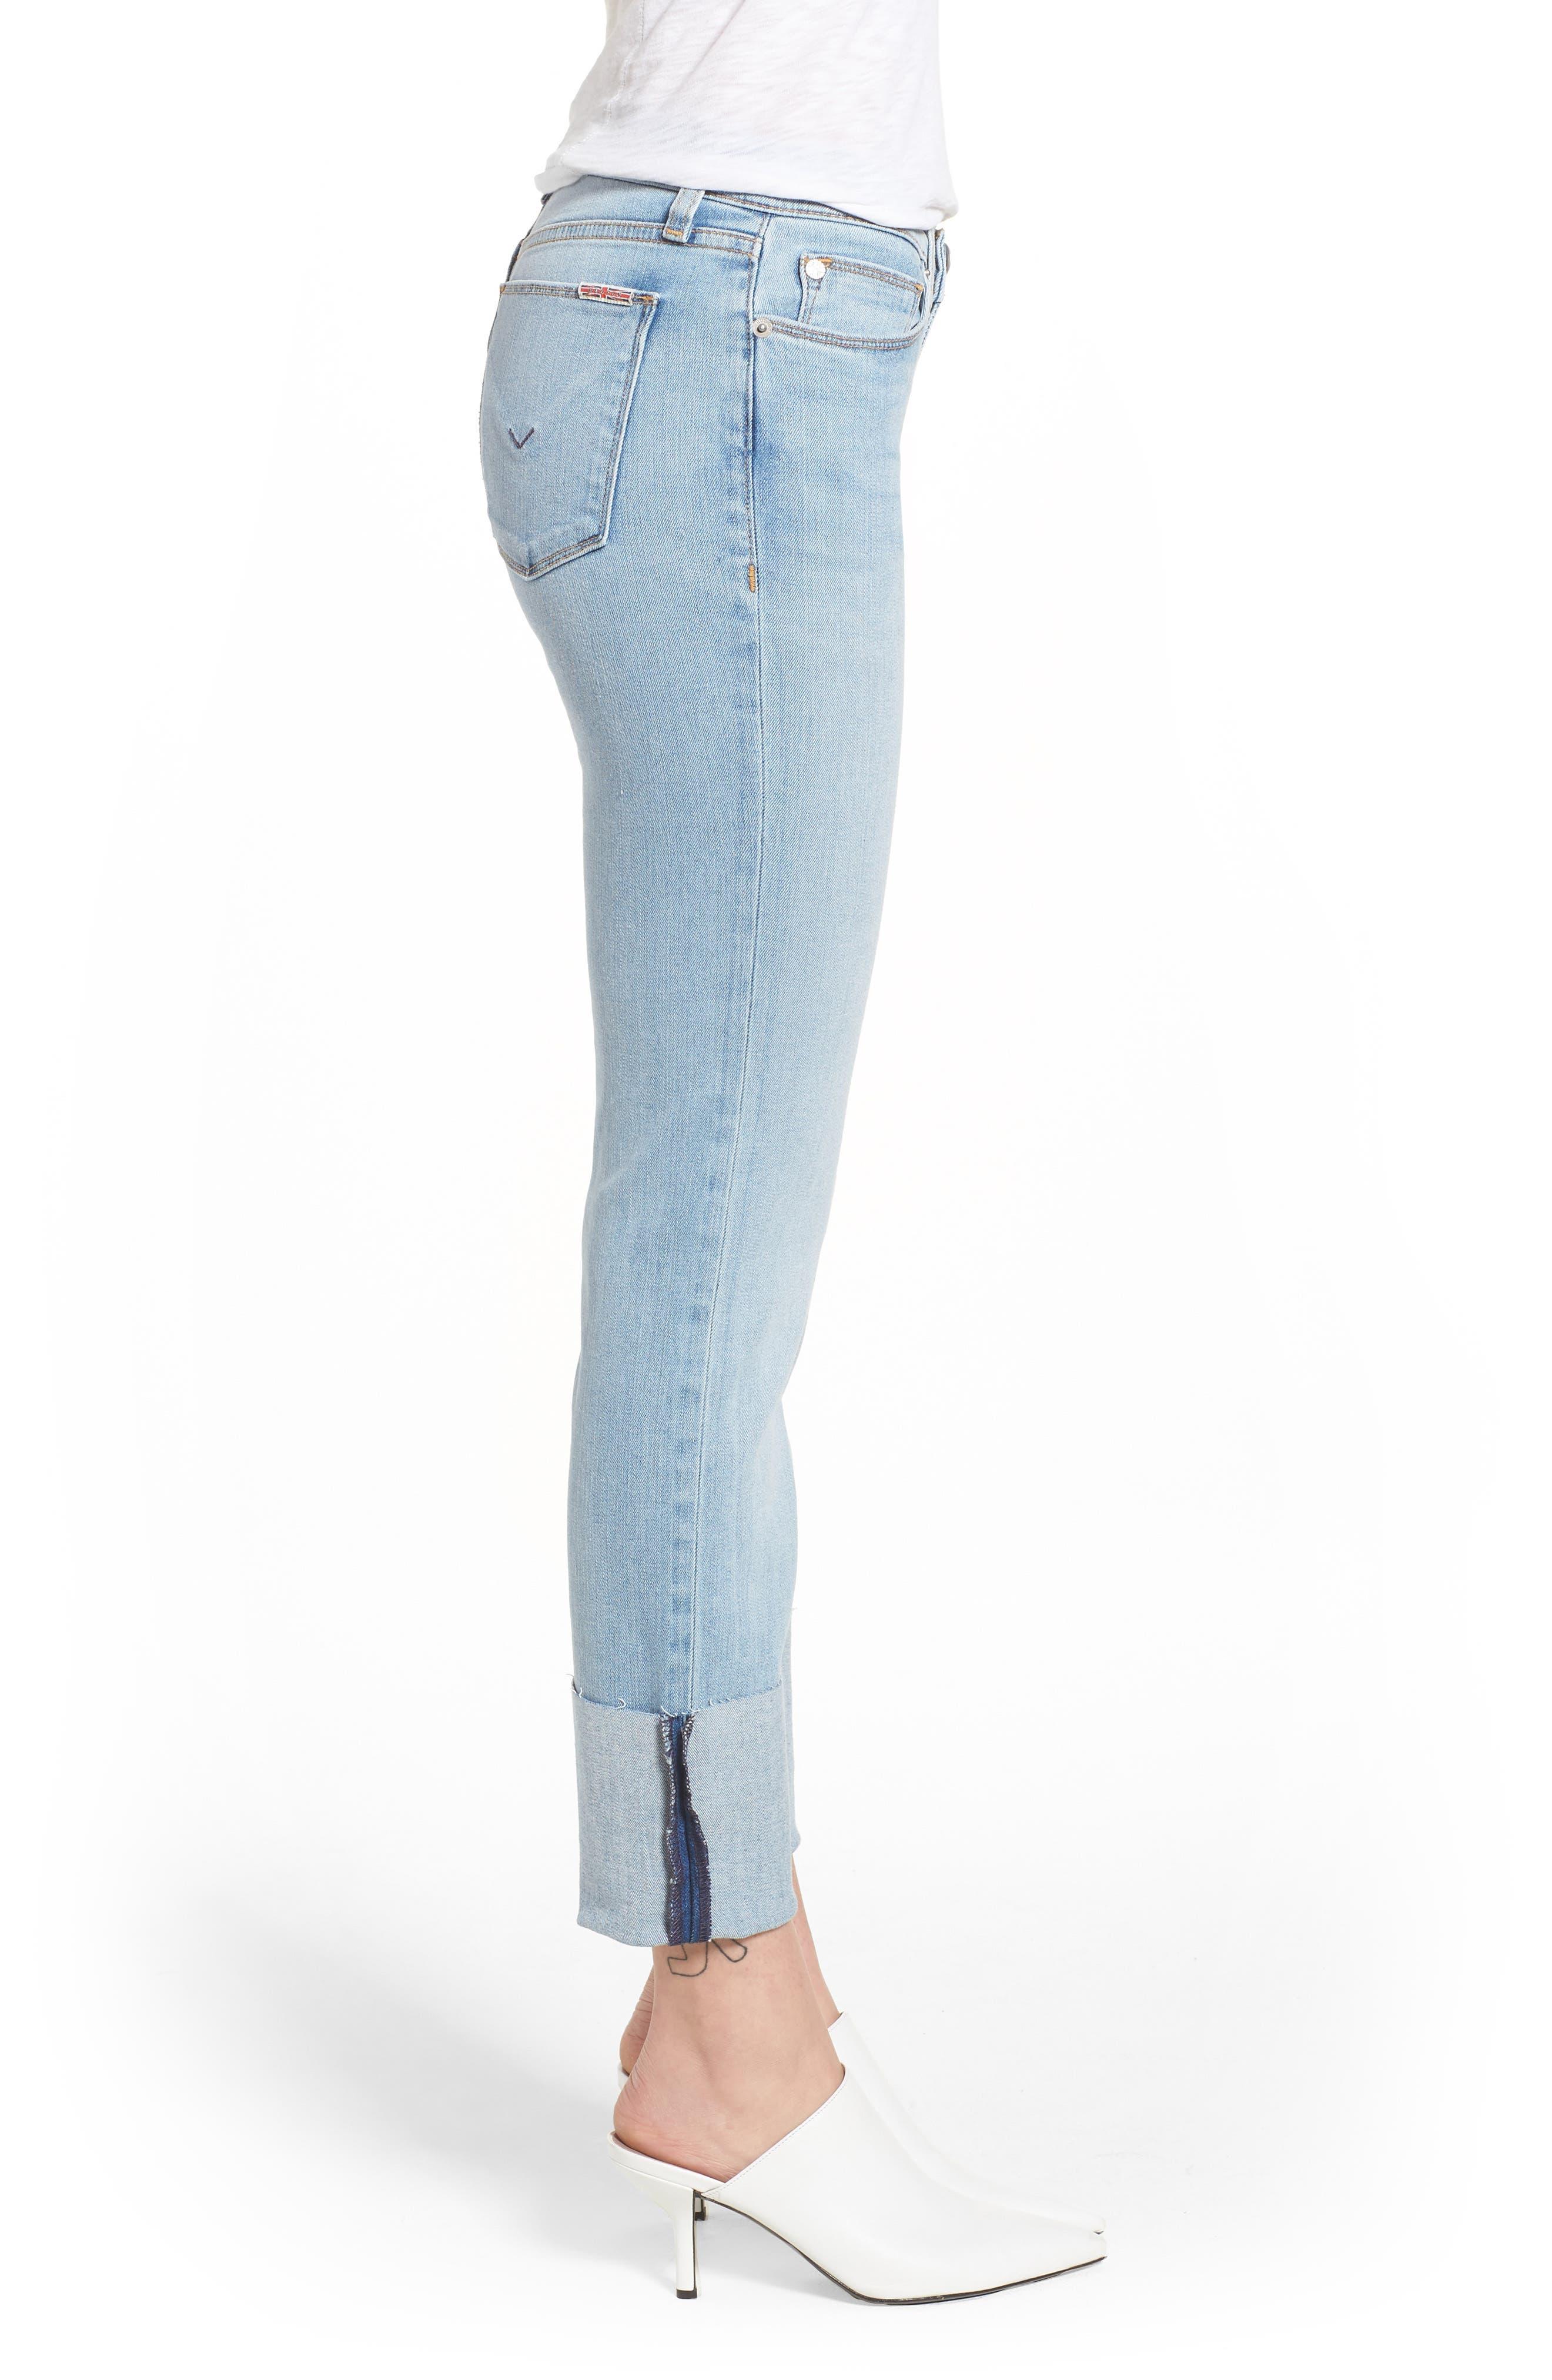 Tally Cuffed Crop Skinny Jeans,                             Alternate thumbnail 3, color,                             Gemini